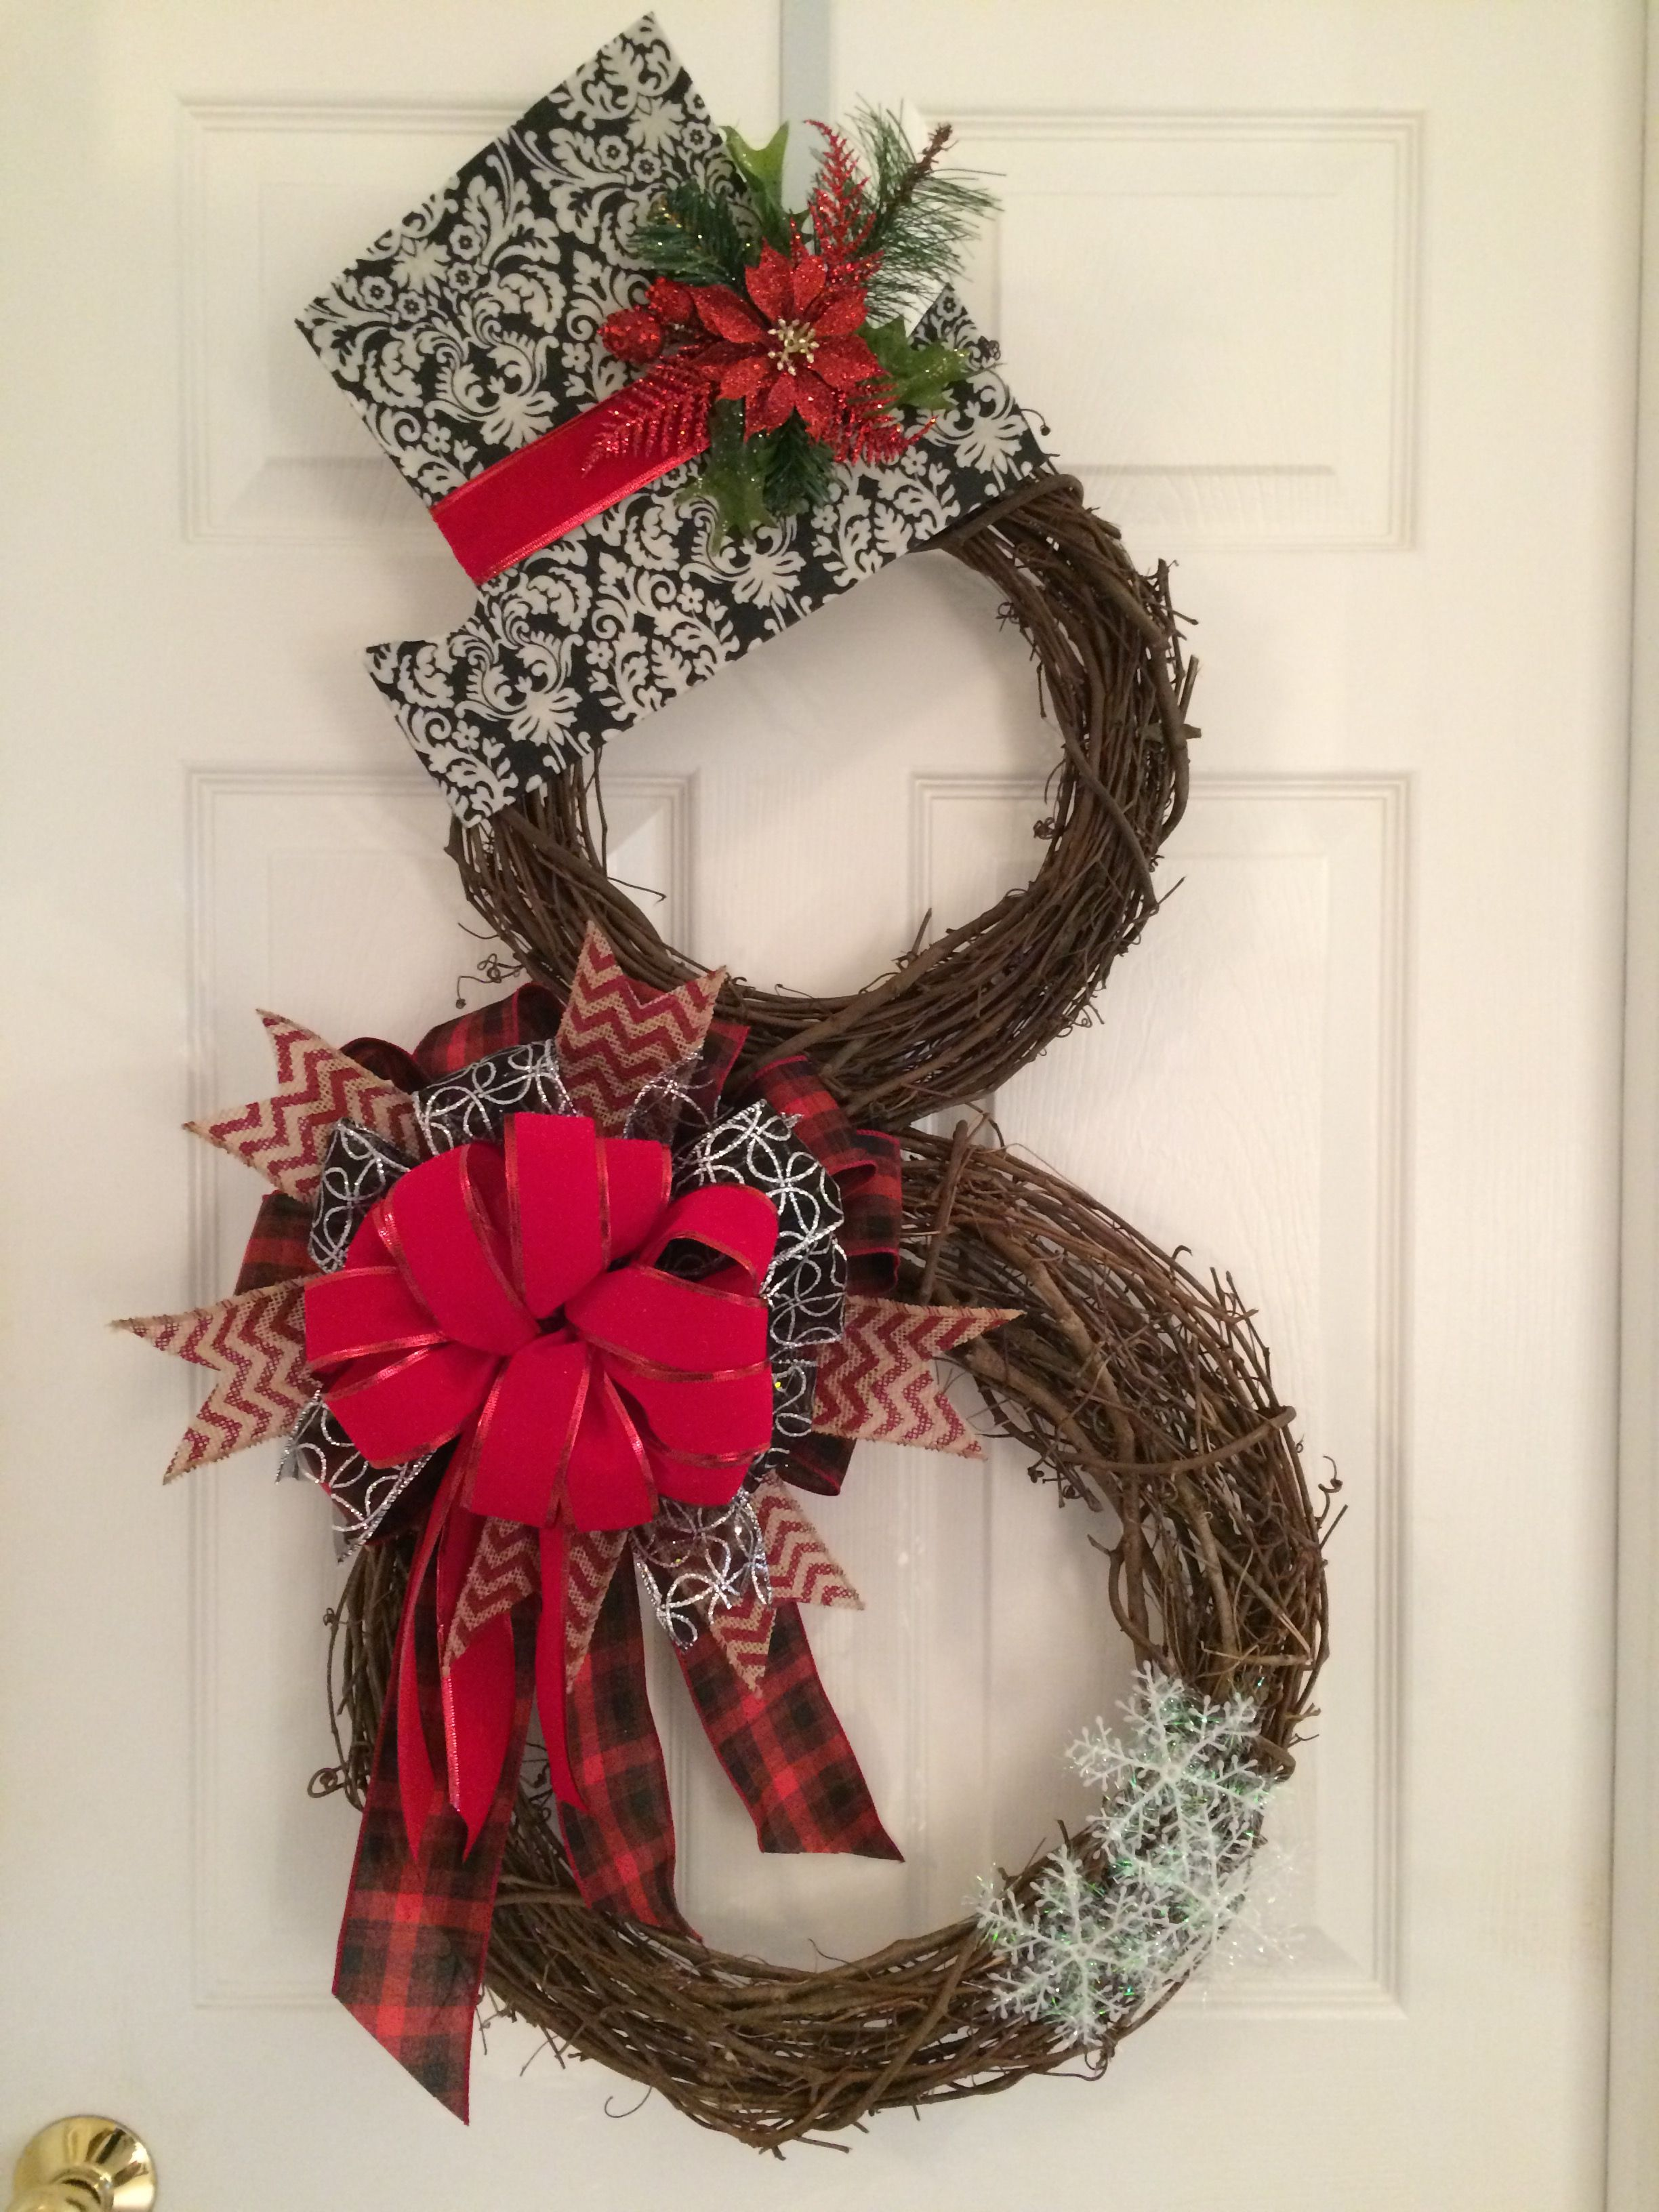 Snowman Grapevine Wreath Christmas Wreaths Diy Christmas Wreaths Holiday Wreaths